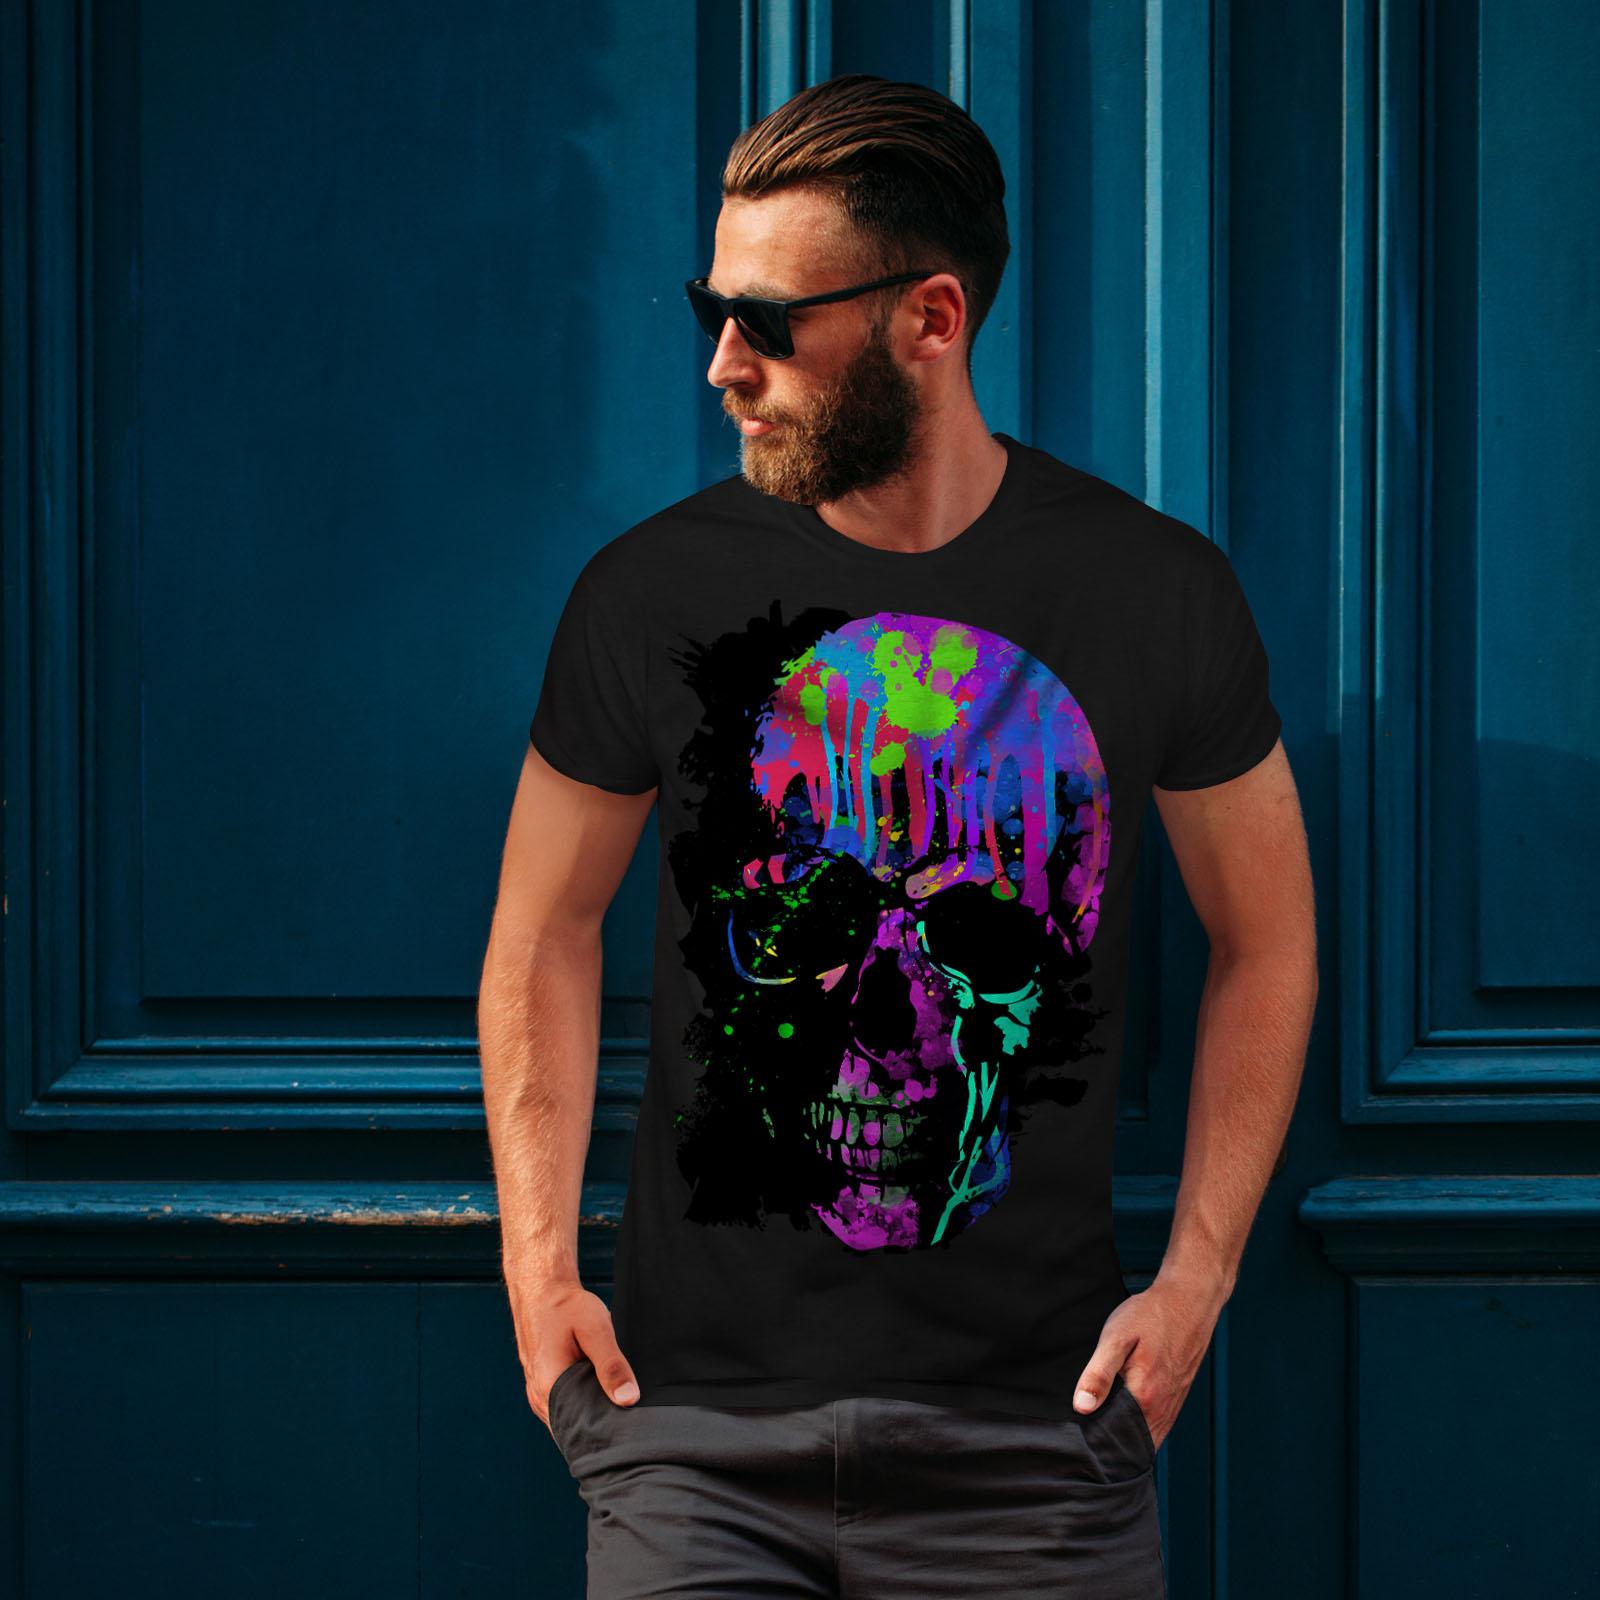 Wellcoda-Skull-Artsy-Mens-T-shirt-Neon-Night-Graphic-Design-Printed-Tee thumbnail 4